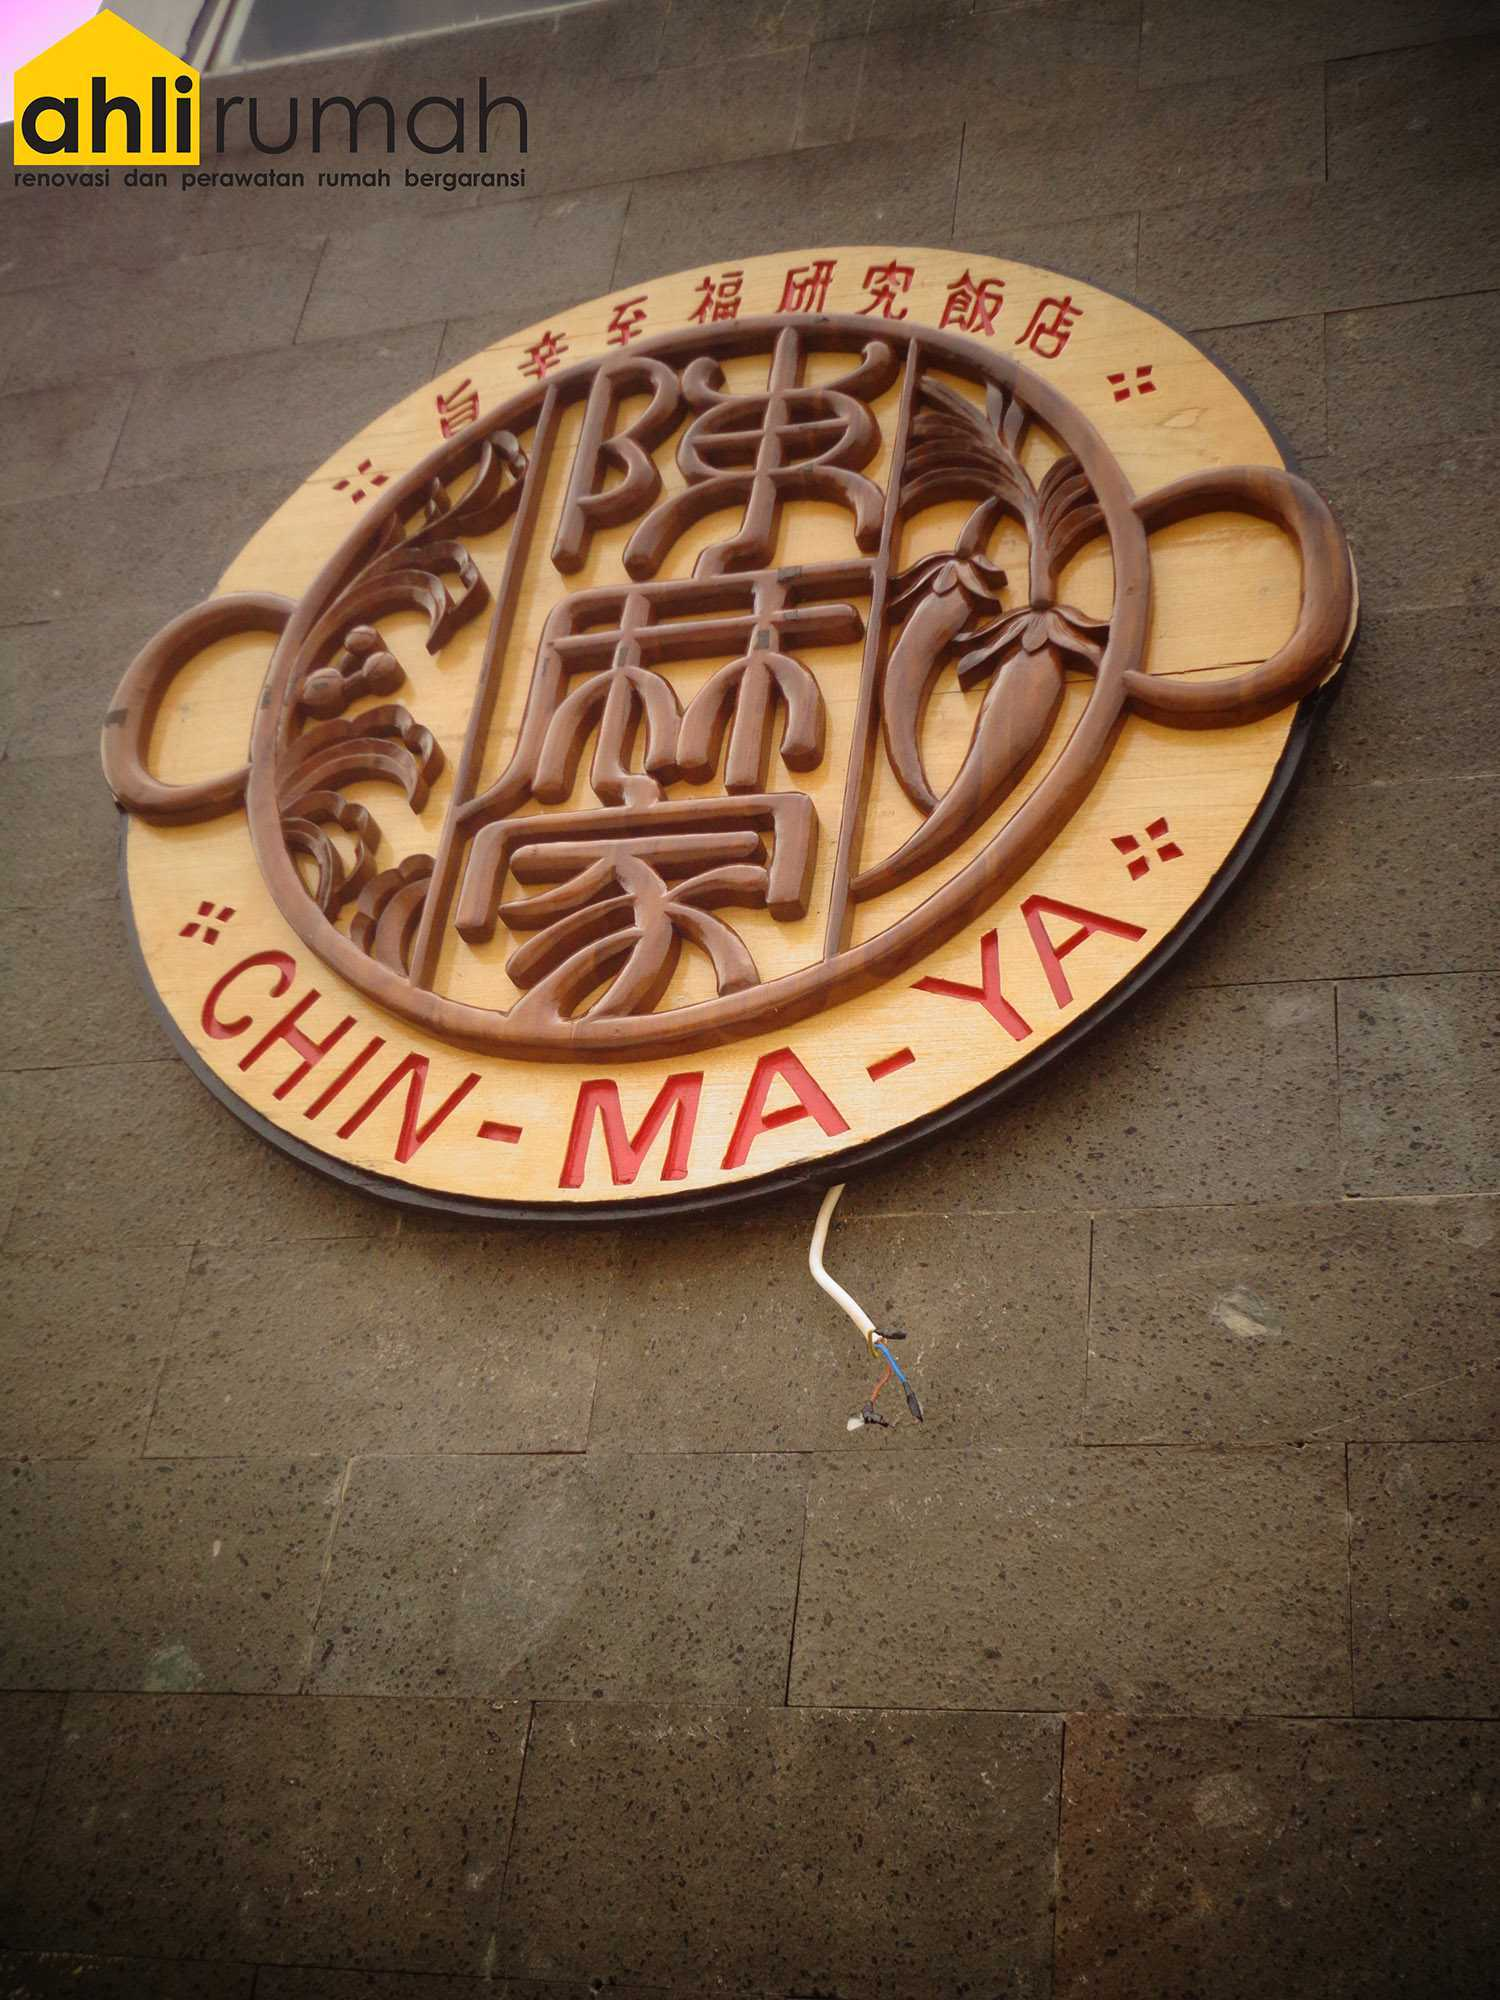 Ahlirumah.id Interior - Chin Maya Restauran Ruko Glaze 2 Blok D No. 17, Jl. Boulevard Raya Gading Serpong, Klp. Dua, Tangerang, Banten 15810, Indonesia  Chin-Ma-Ya Logo   49235